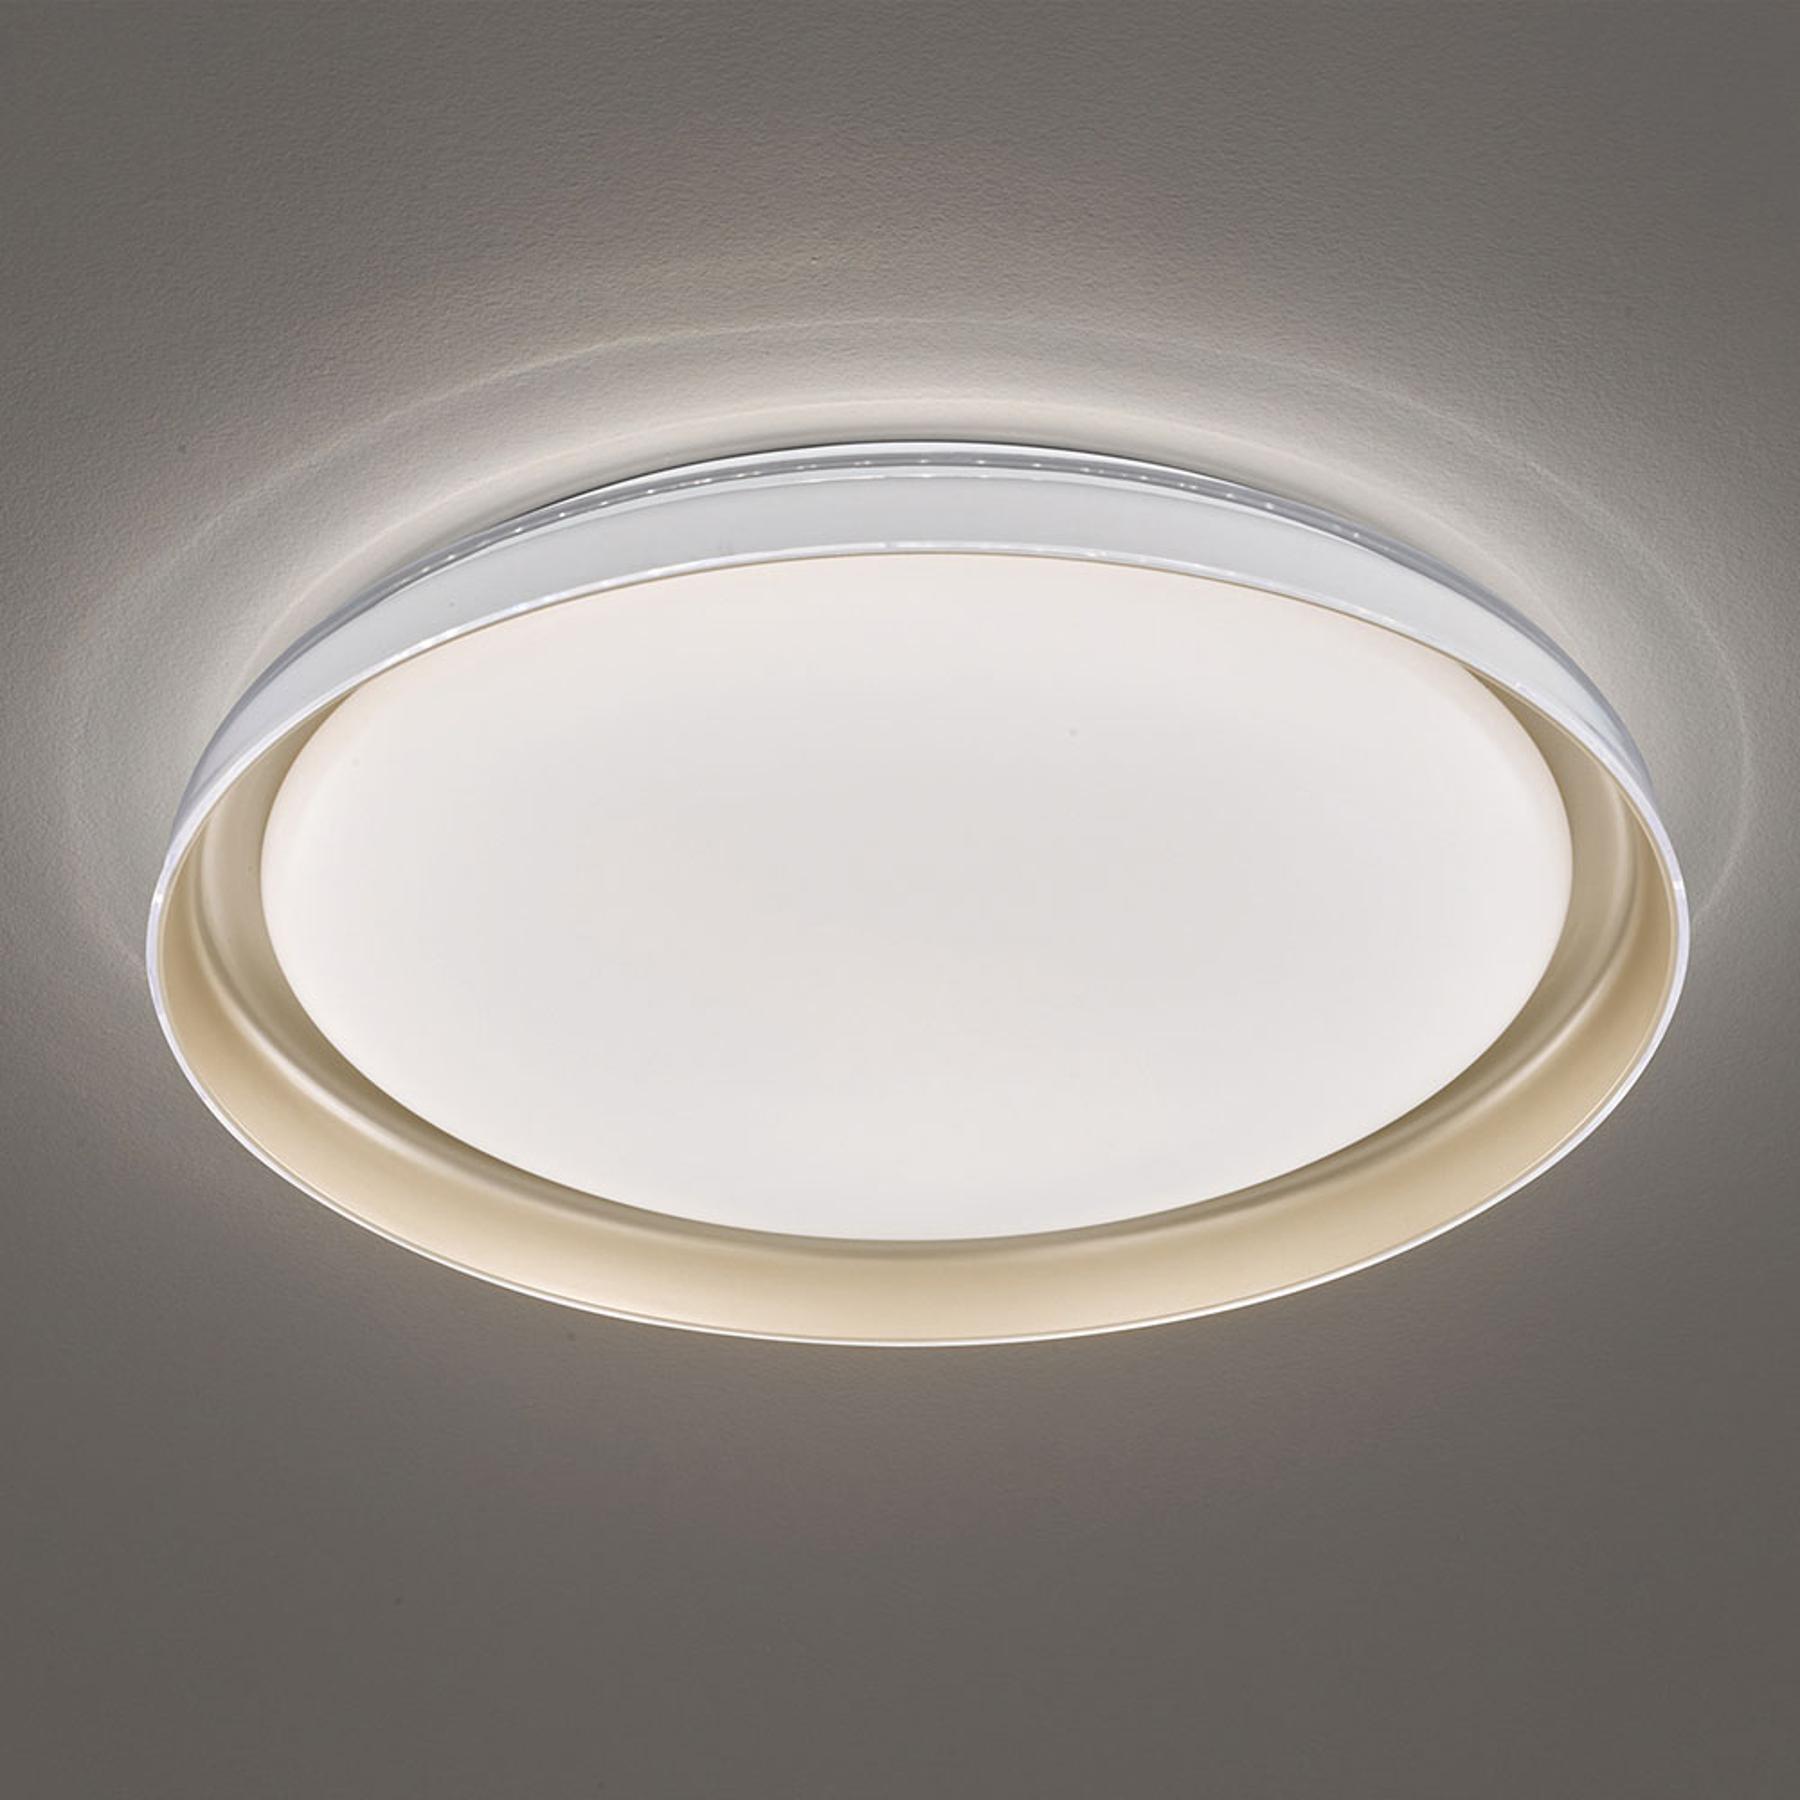 Lampa sufitowa LED Rilla, ściemniana, Ø 43 cm